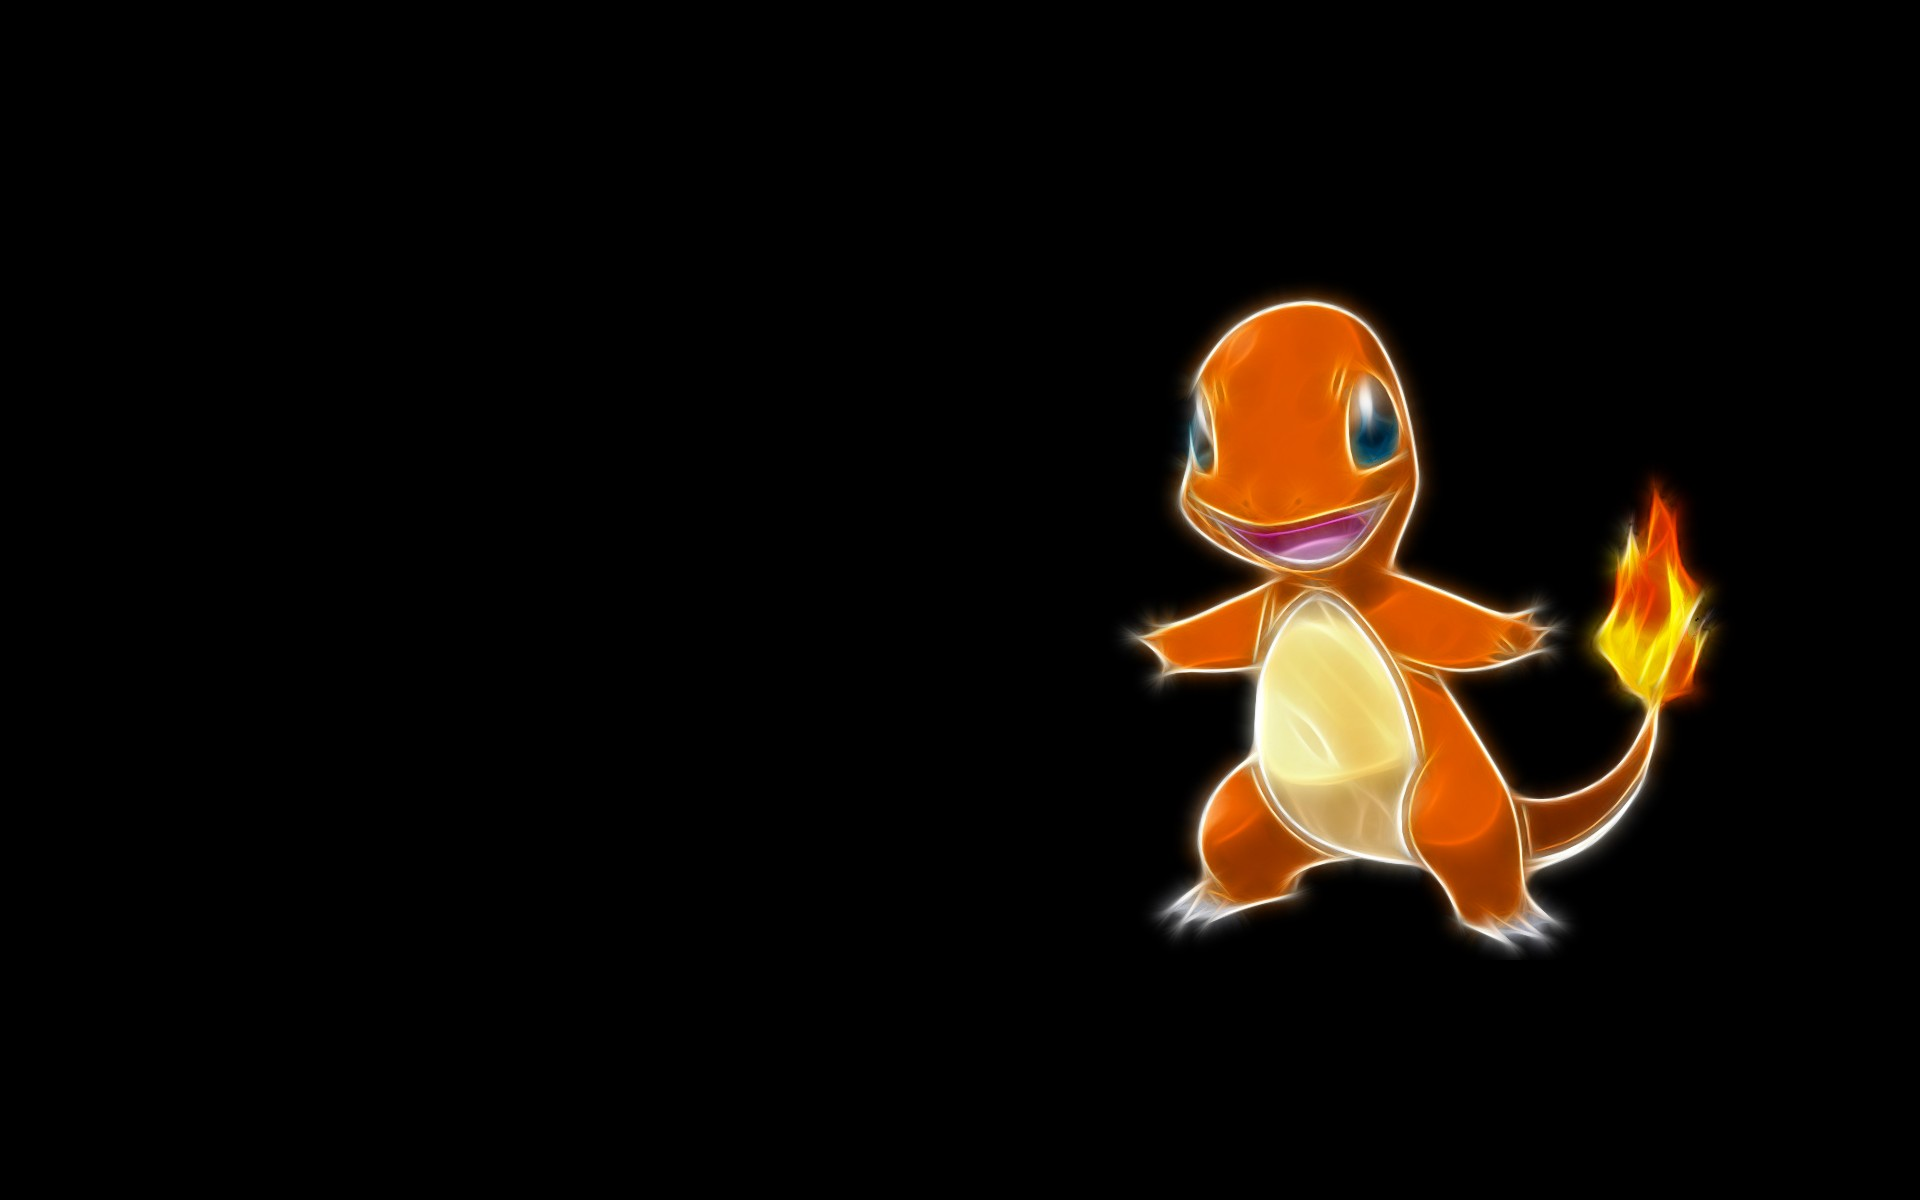 56+ Cool Pokemon Wallpapers ·① Download Free Amazing